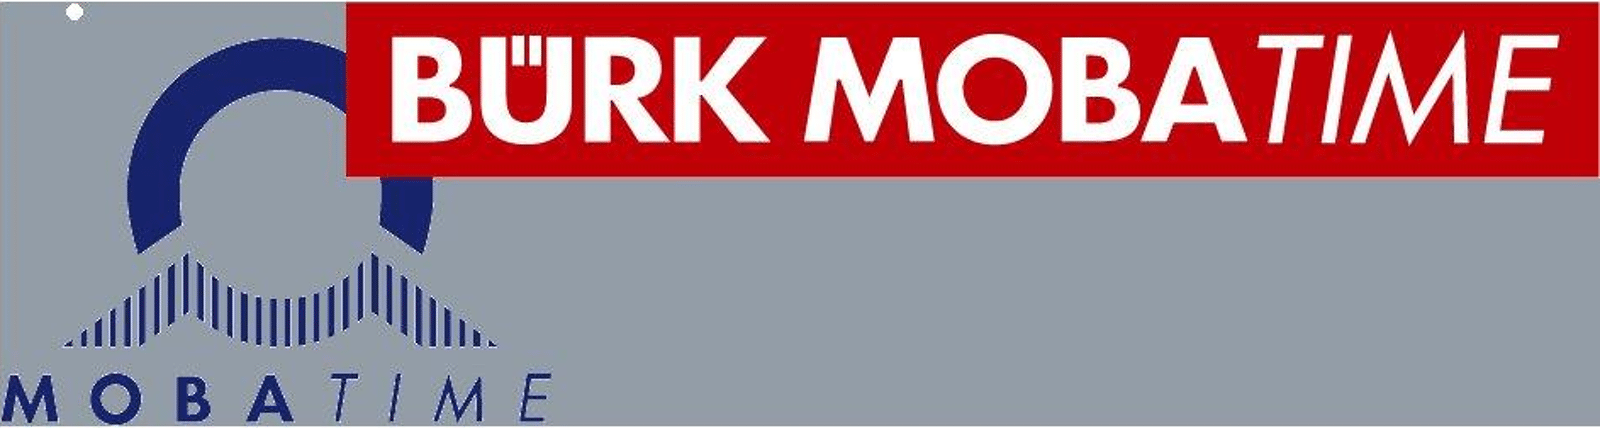 Bürk Mobatime